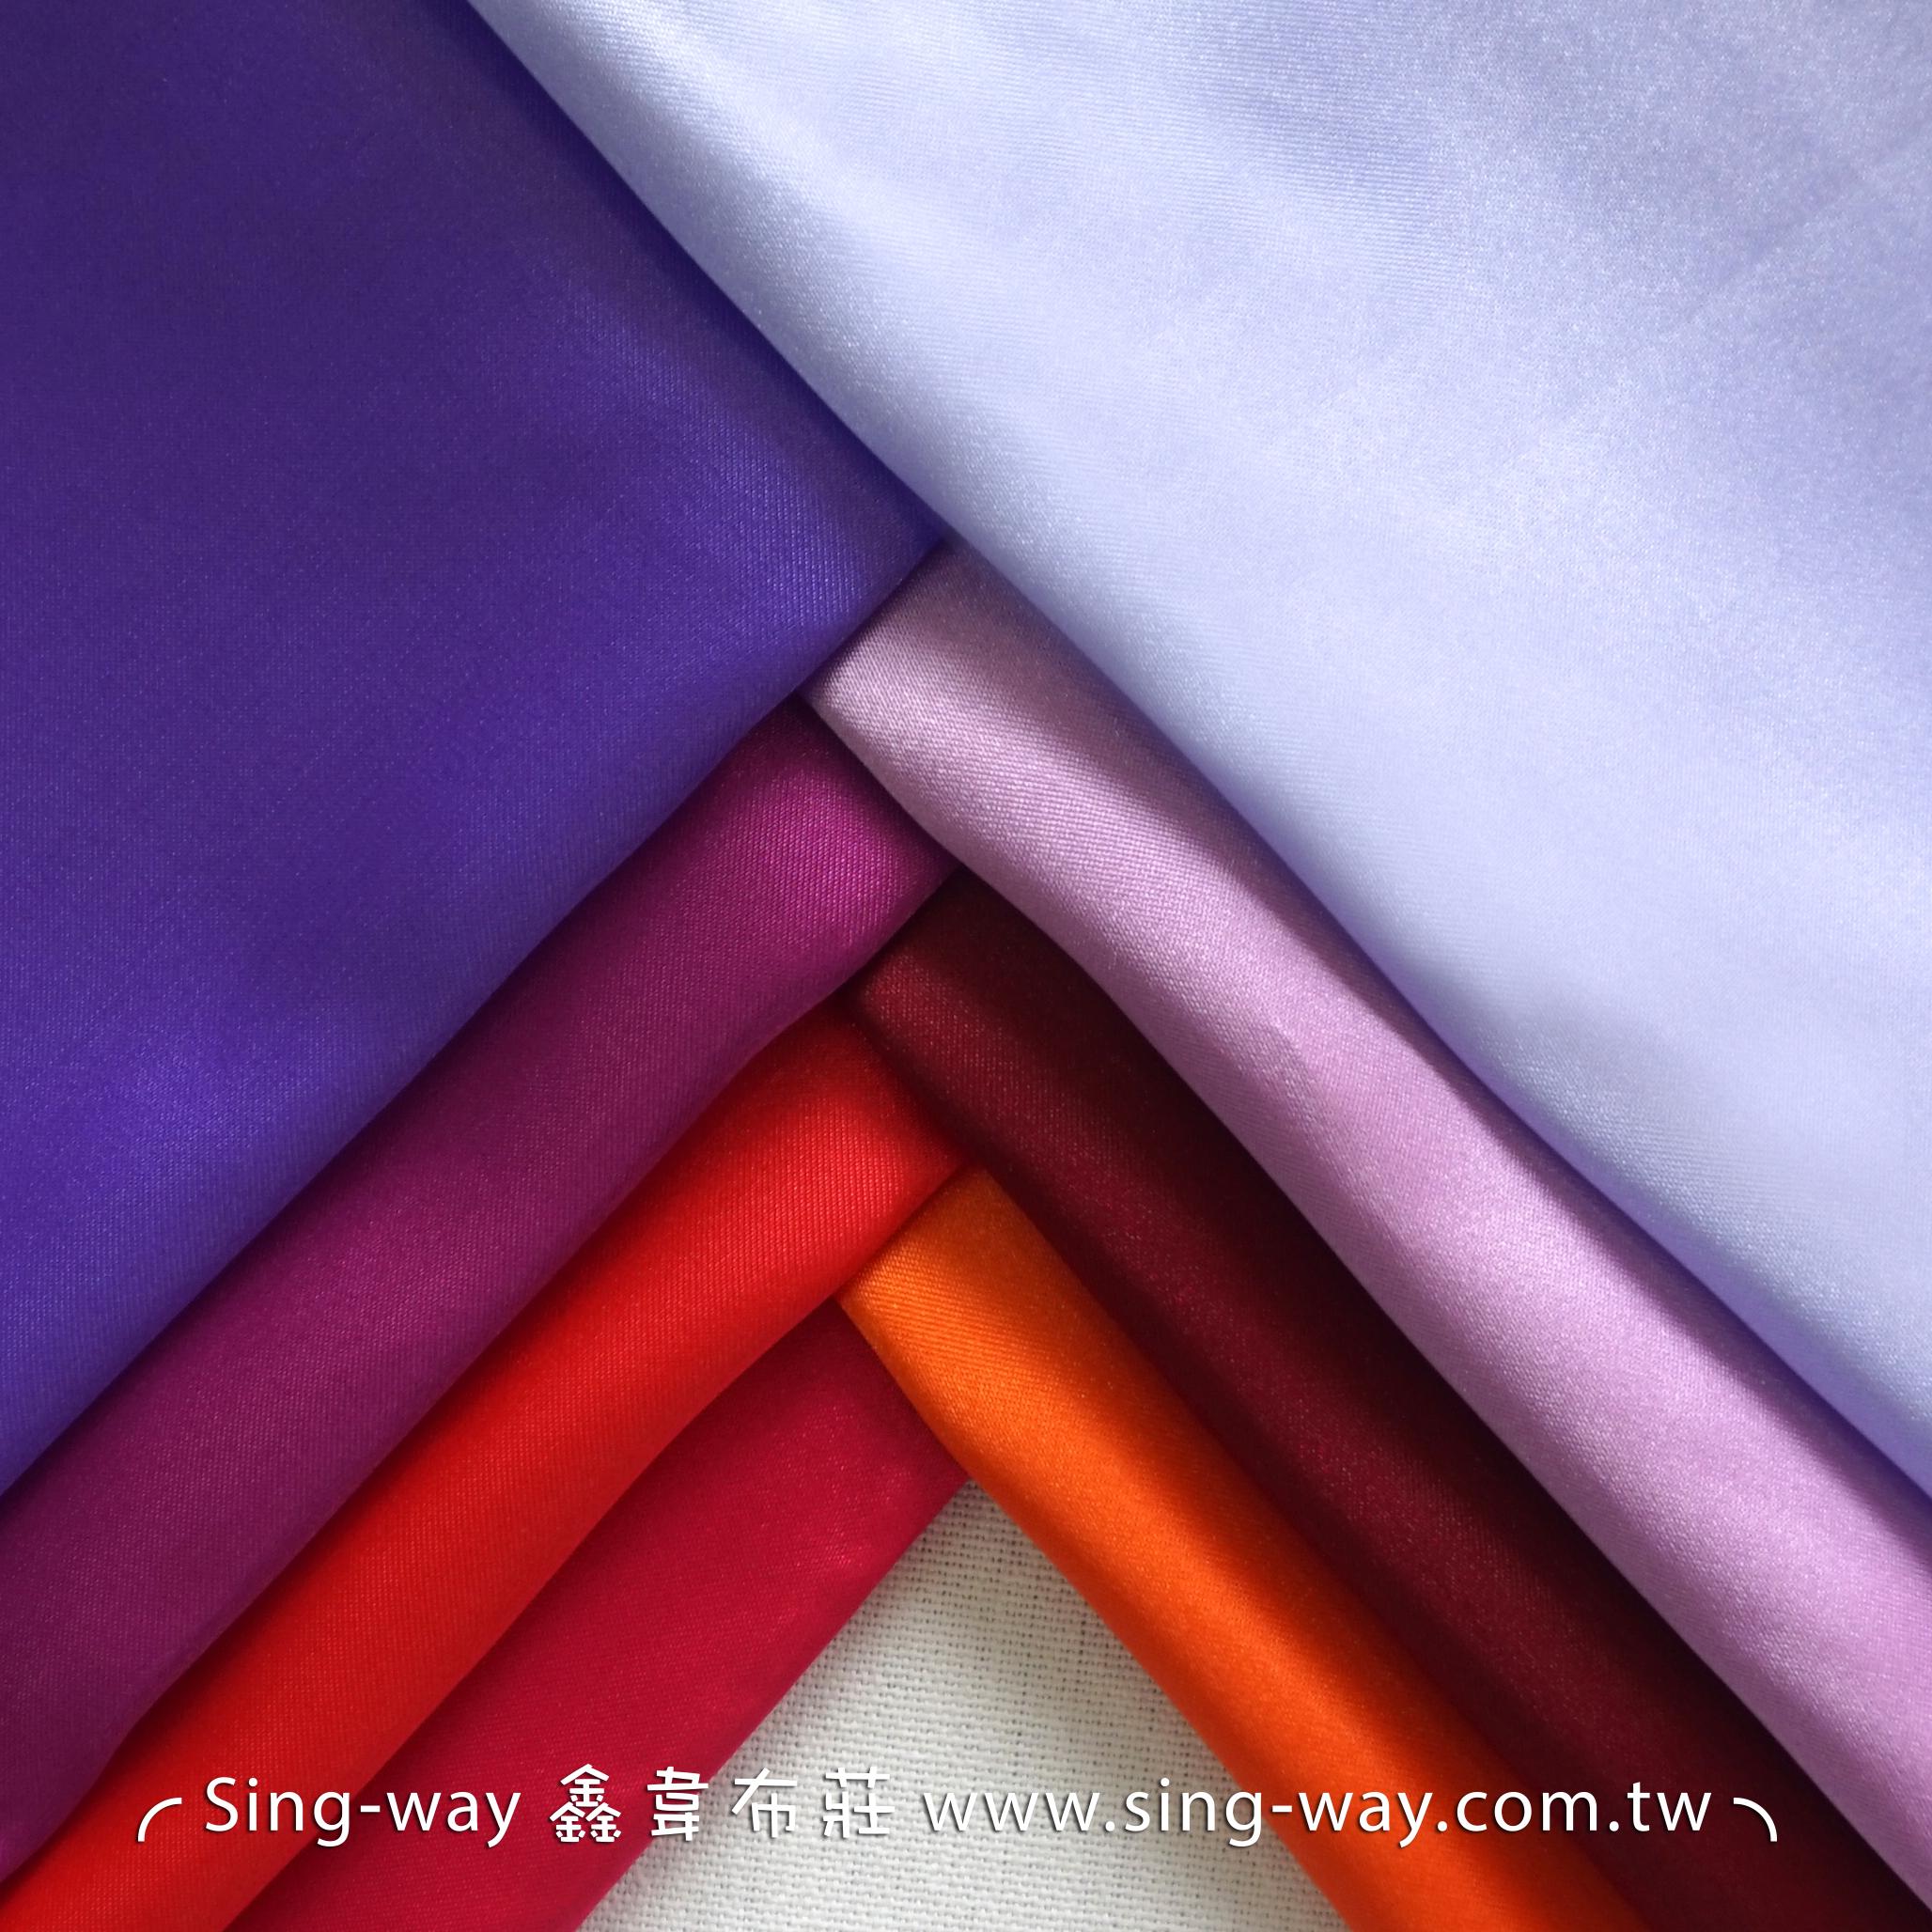 LD290077 紅粉紫色系 素面緞面 沙典 秀士 三角緞 亮面節慶裝飾 桌巾 表演舞台禮服 服裝布料